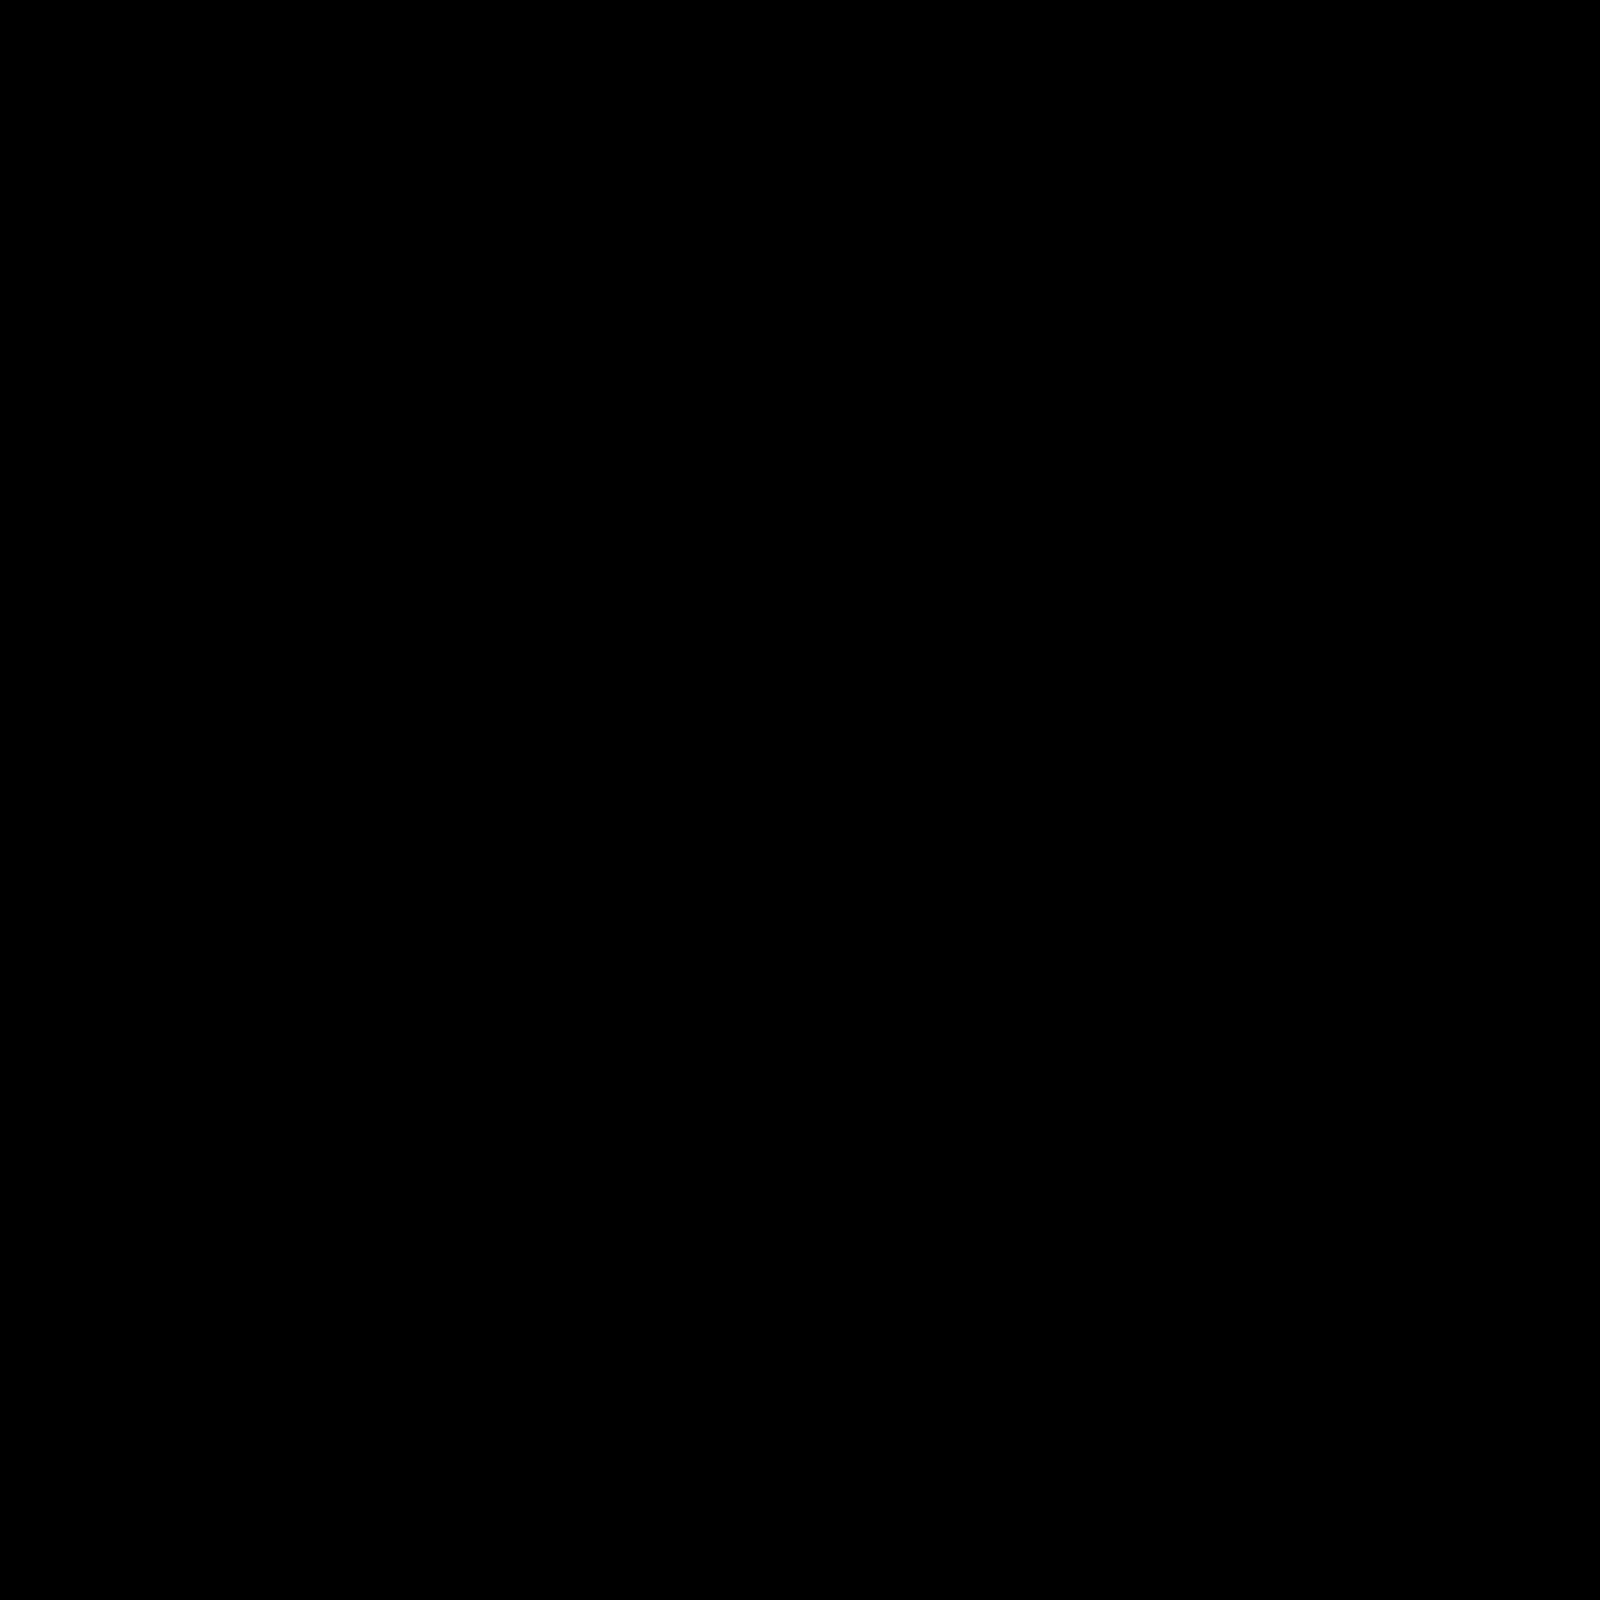 Aircraft icon free download. Emoji clipart plane